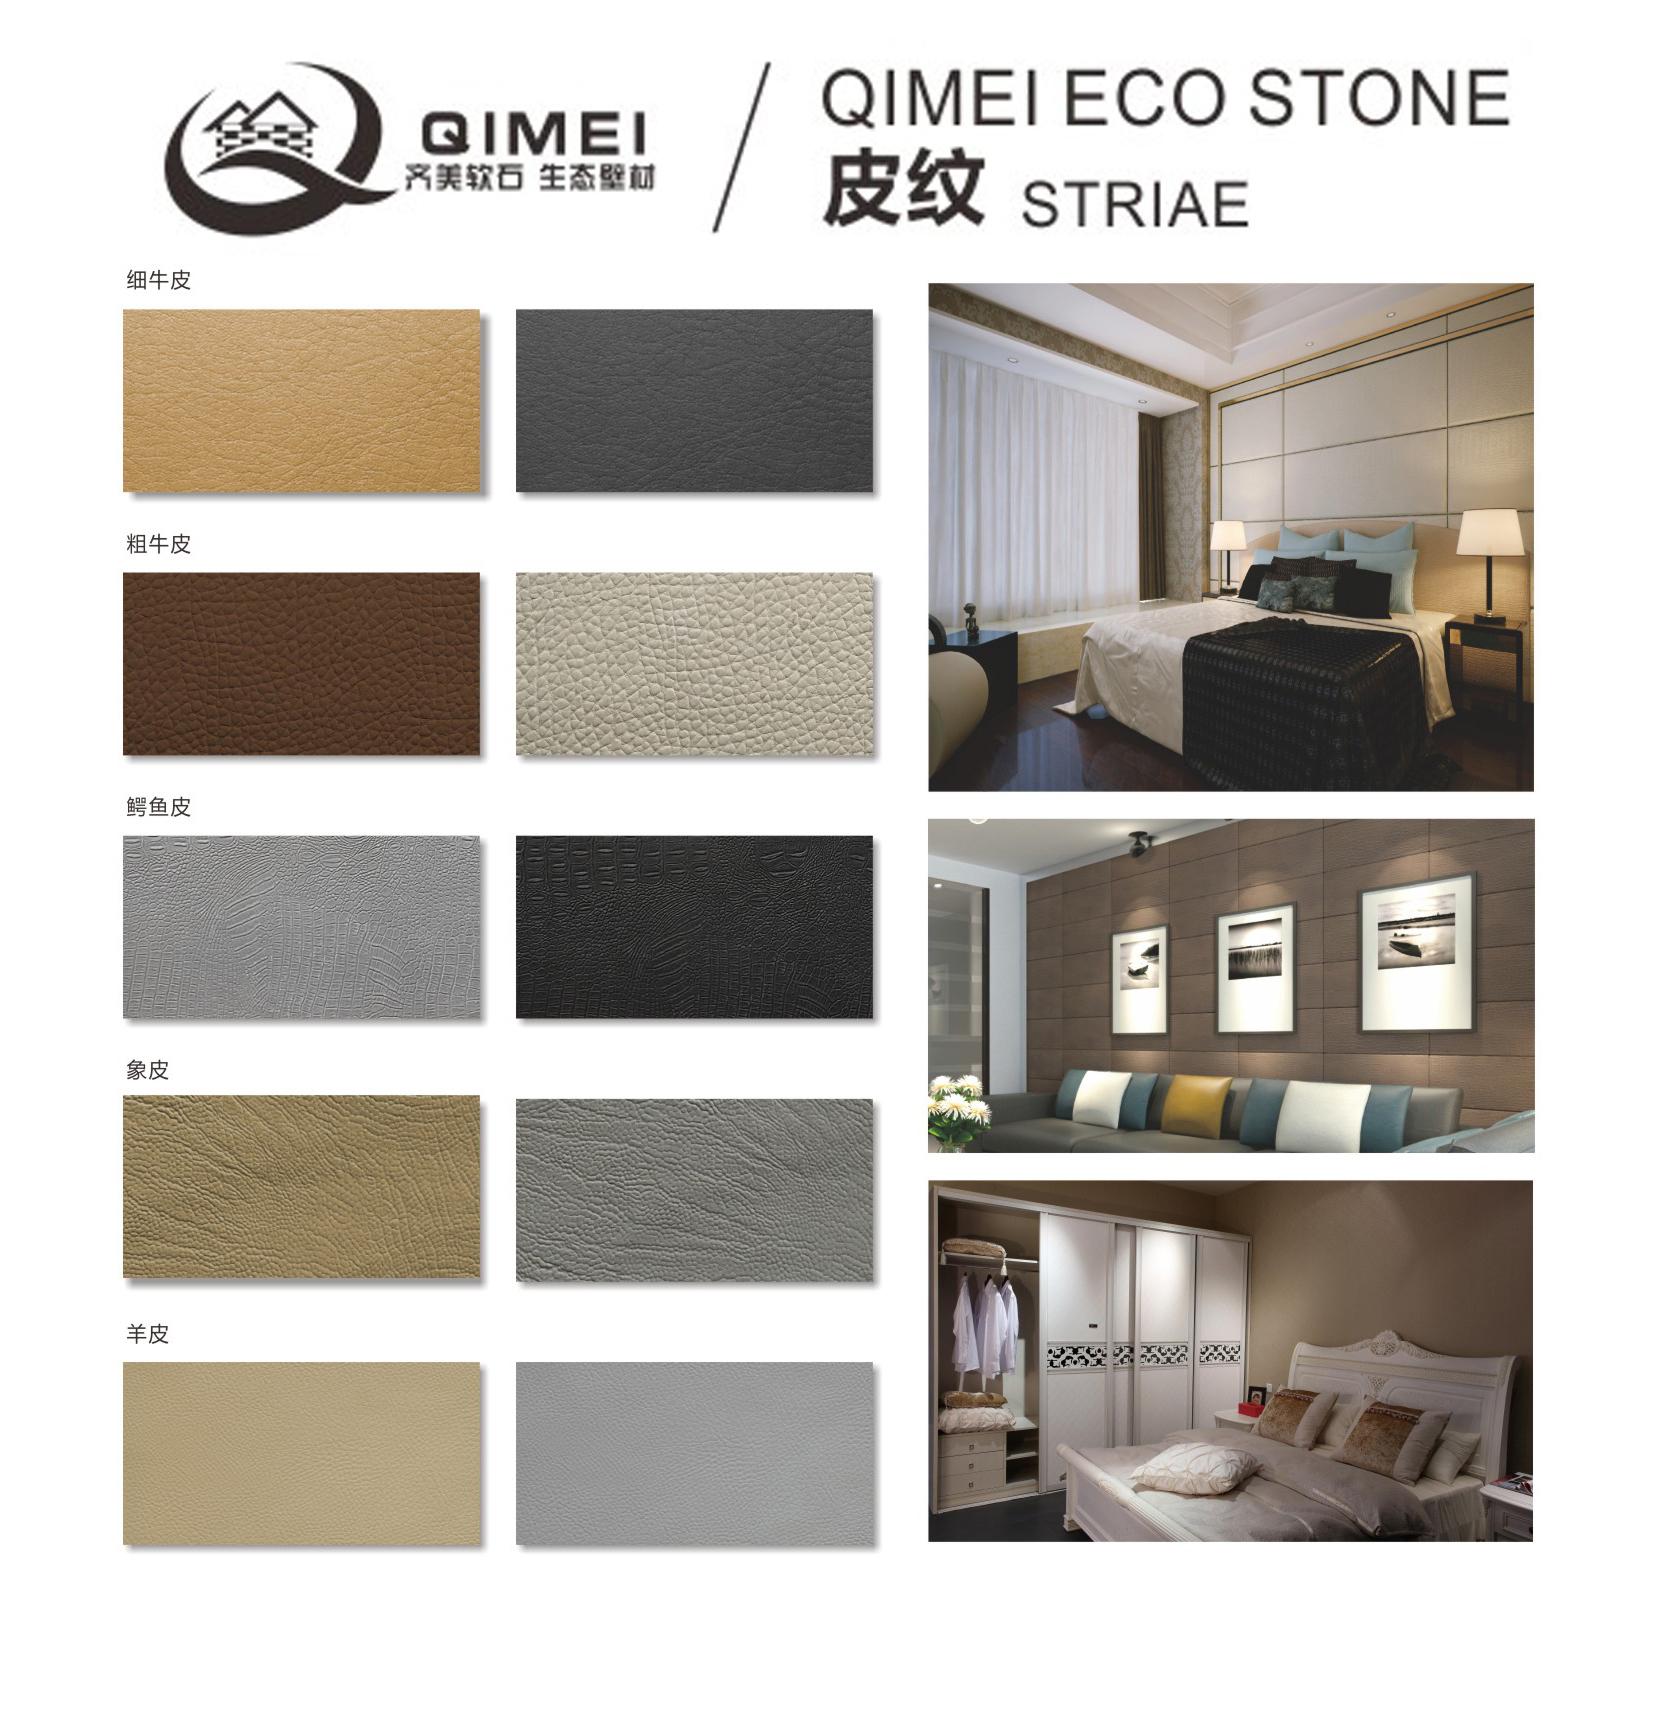 CHINA baidai personalized animal skin pattern leather stone texture light weight and safety